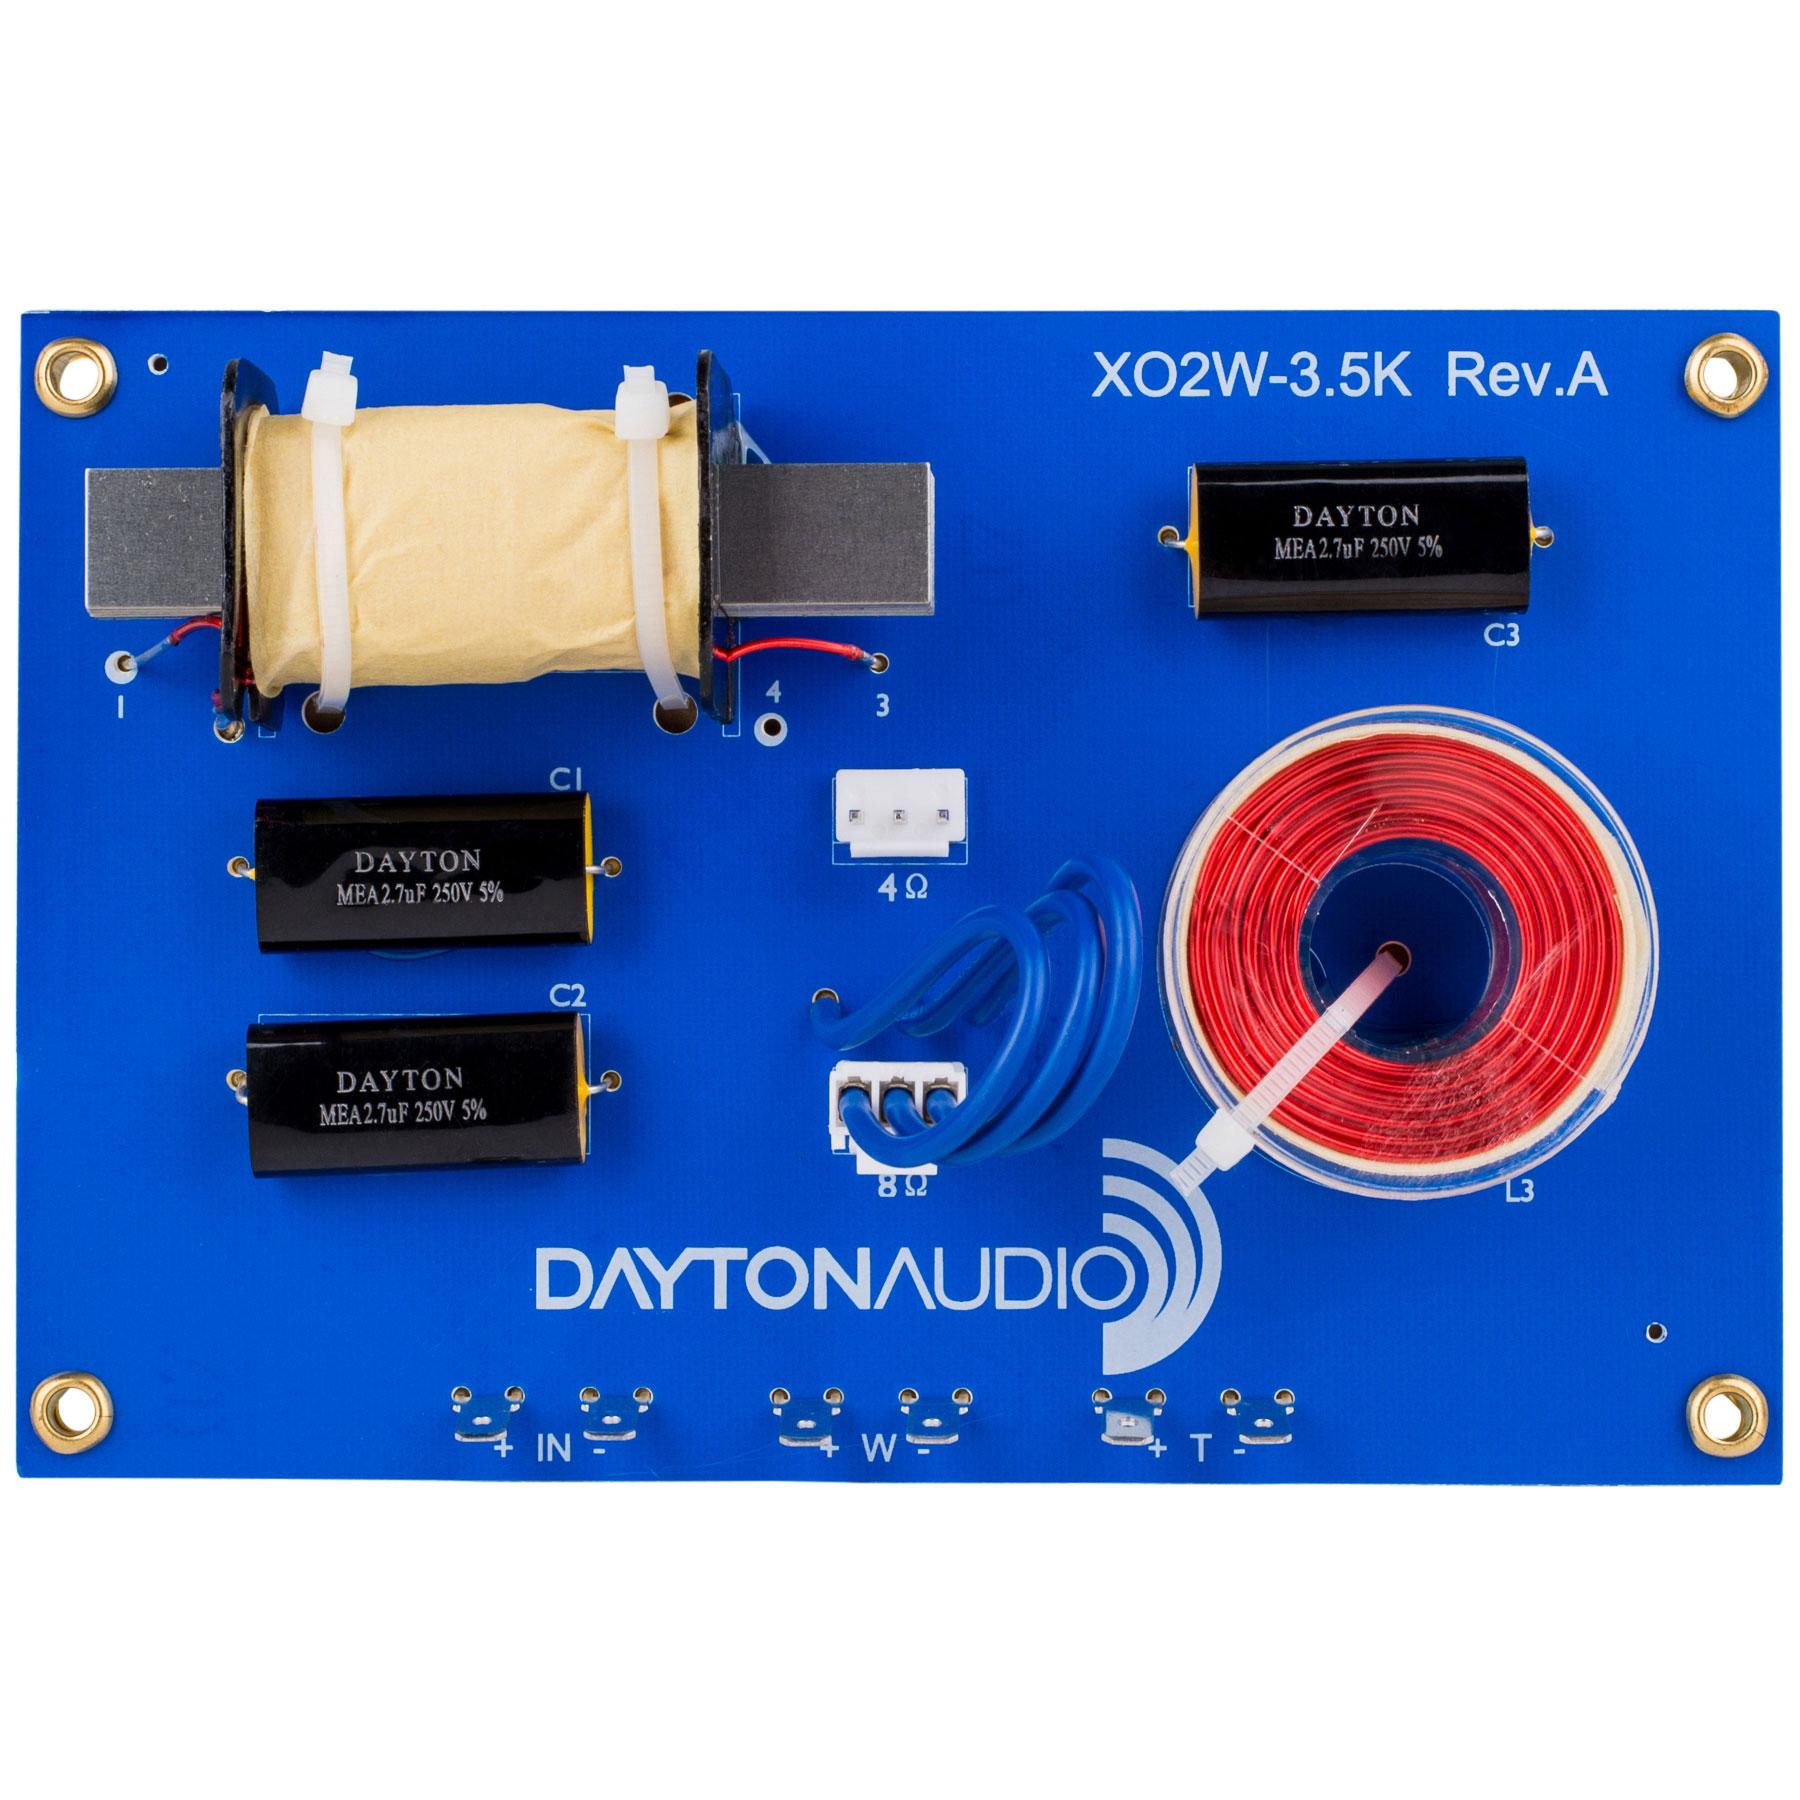 Dayton Audio XO2W-3.5K画像